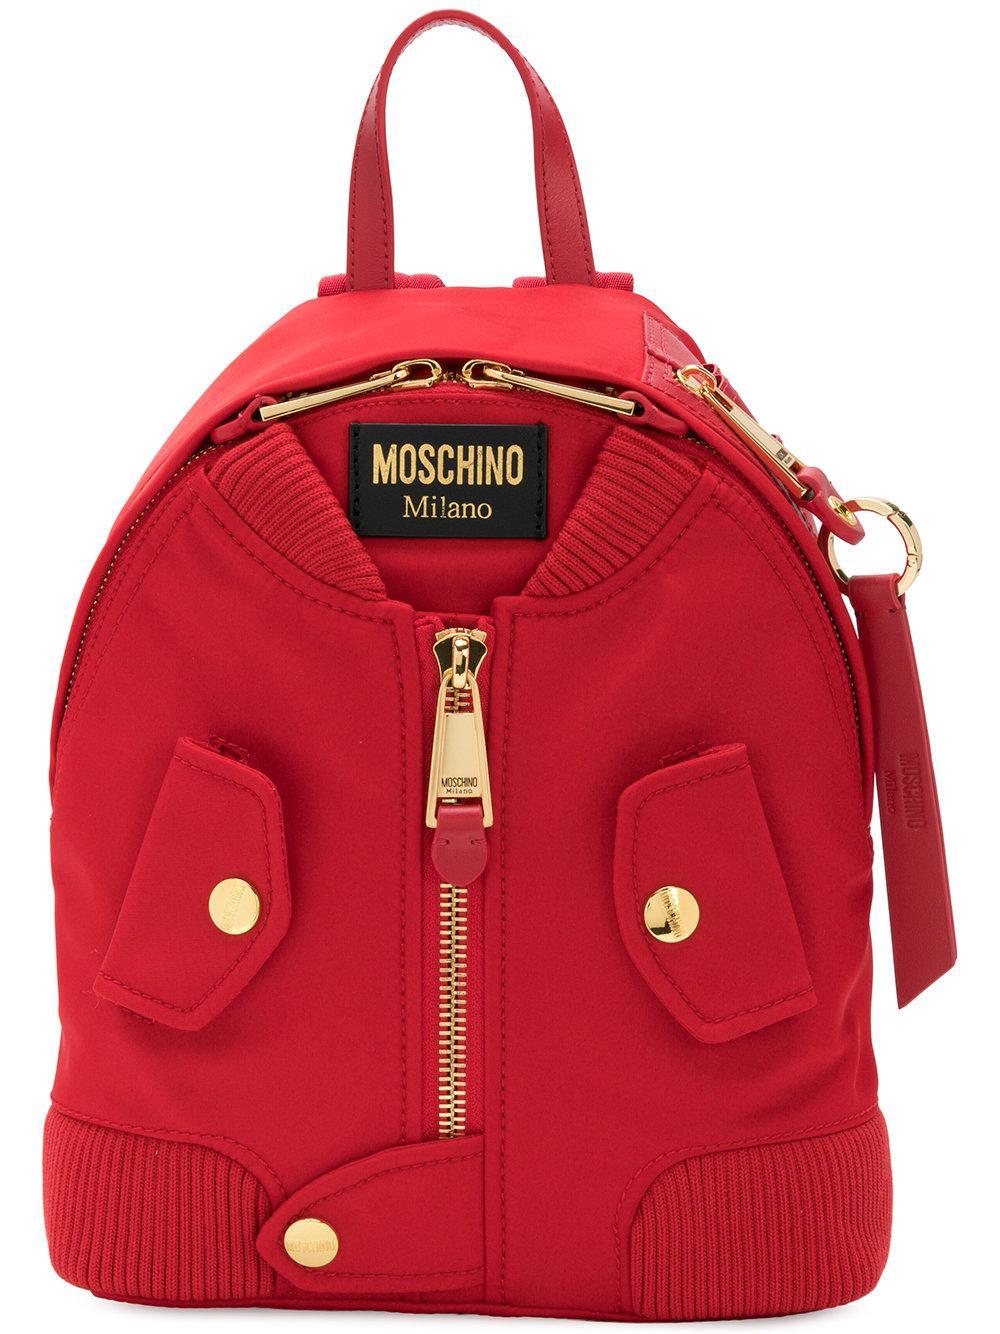 Moschino Bomber Jacket Backpack